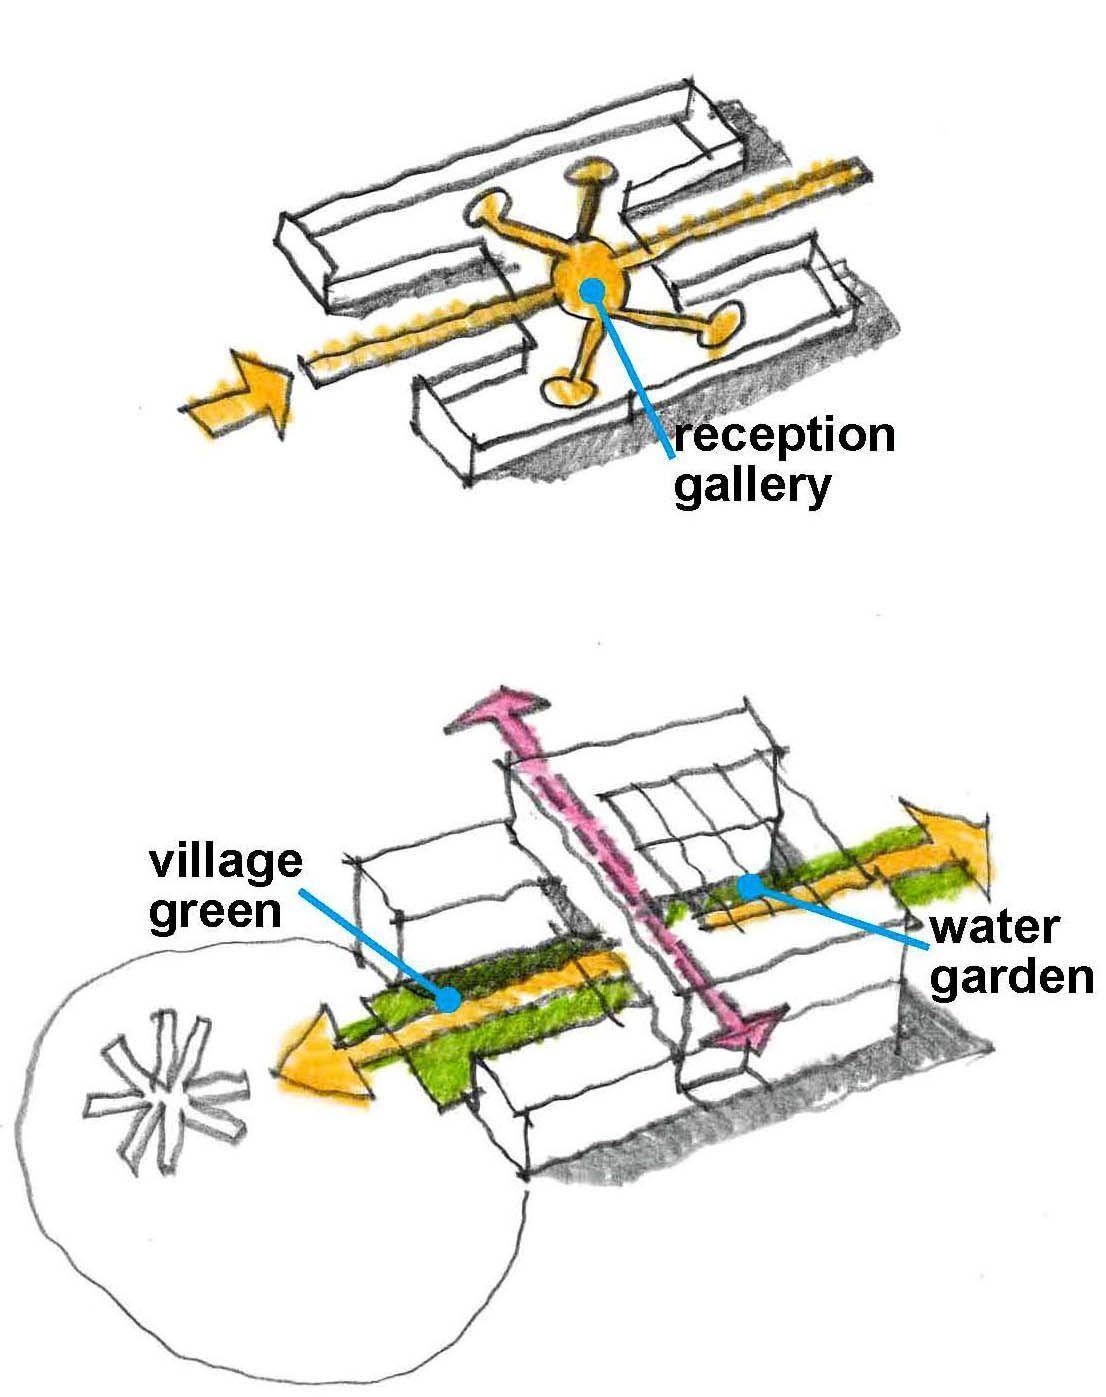 Community building diagram -  Community building diagram  - #architecturalconcep... -  Community building diagram –  Community building diagram  – #architecturalconceptdiagram #archi - #architecturalconceptdiagram #architecturalconceptualmodel #architecturalconcep #building #community #diagram